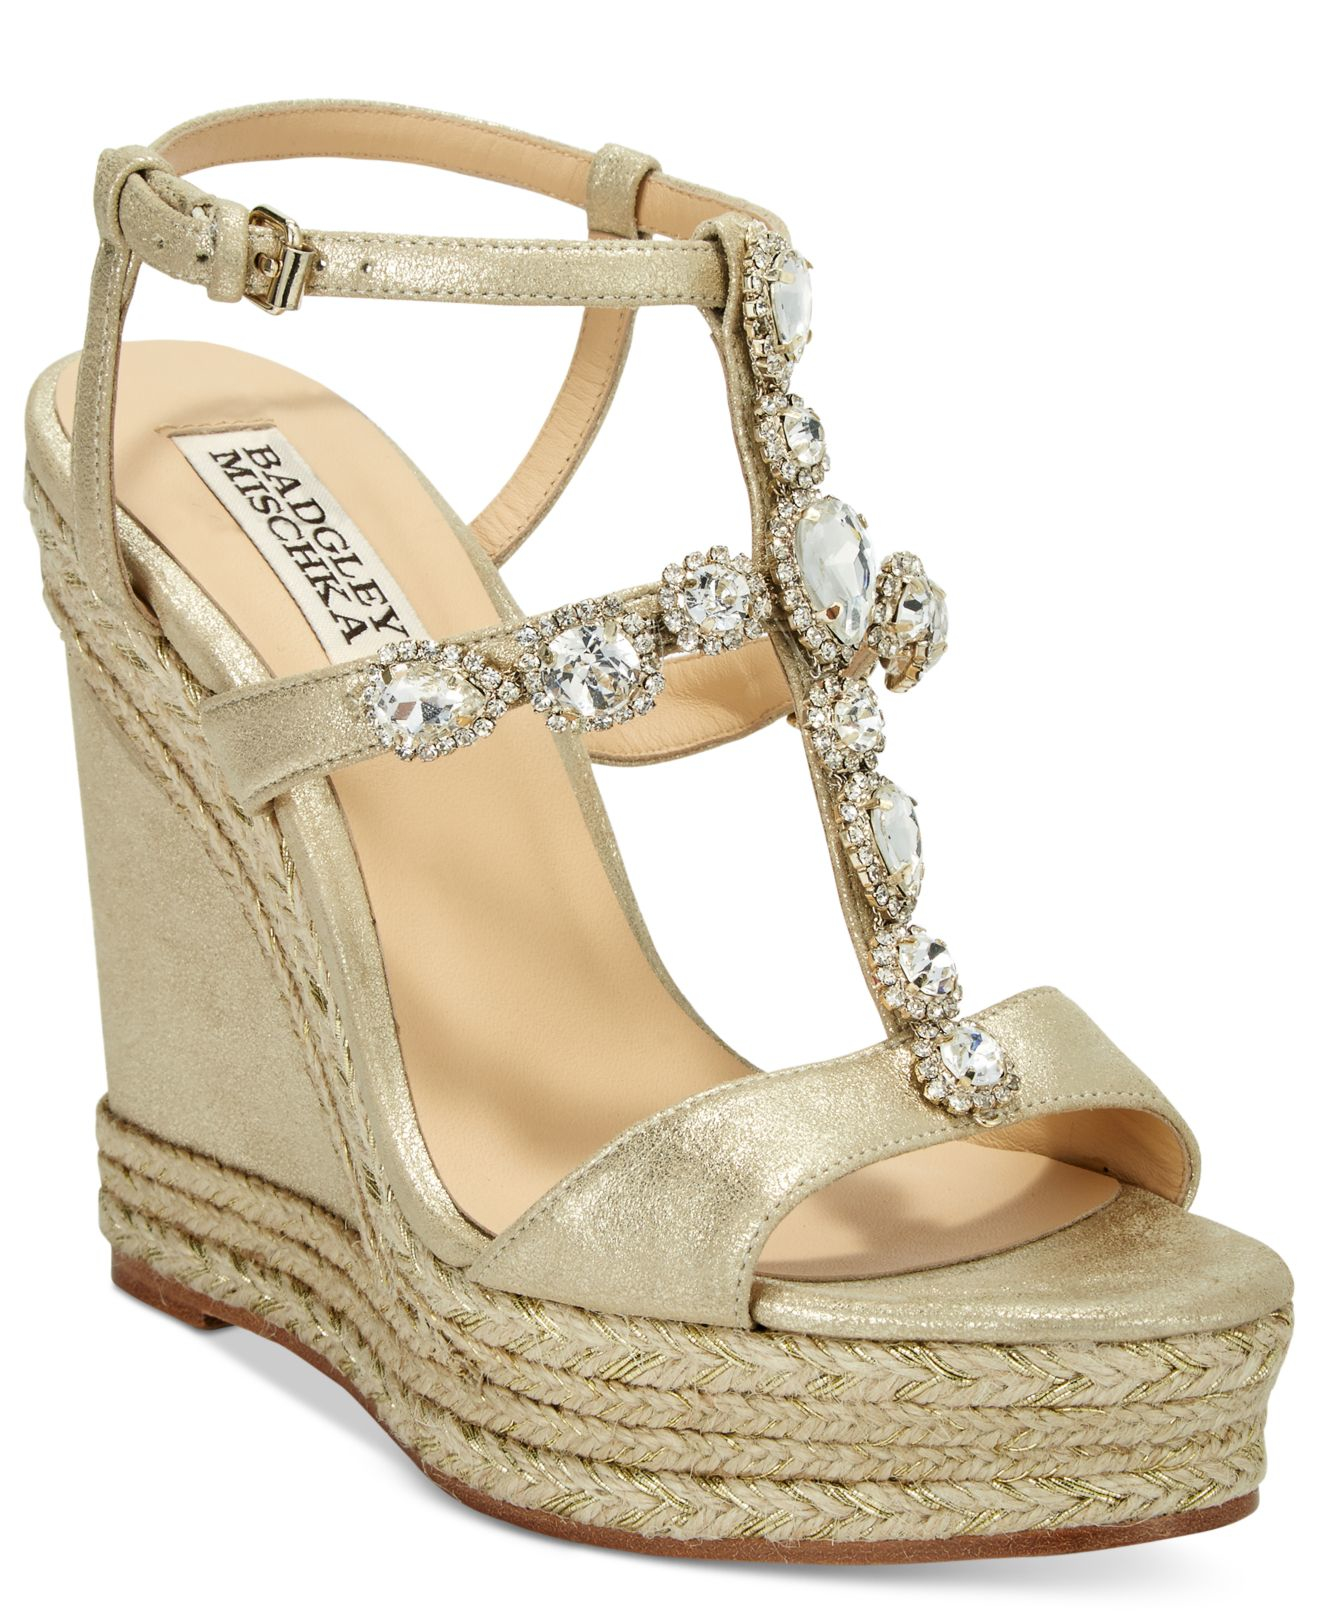 Badgley Mischka Coco Evening Wedge Sandals In Natural Lyst